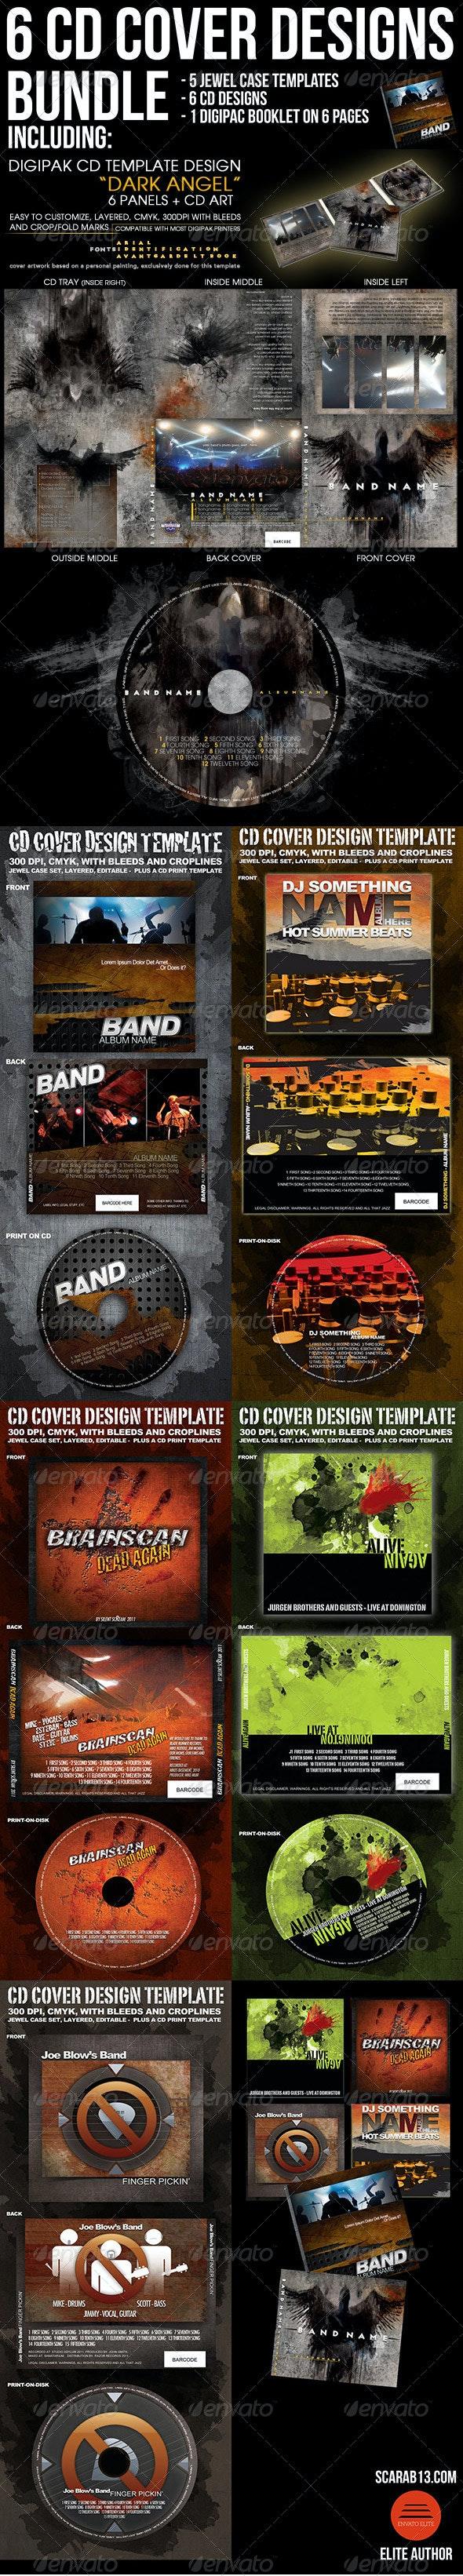 6 CD Cover Design Template Bundle - CD & DVD Artwork Print Templates